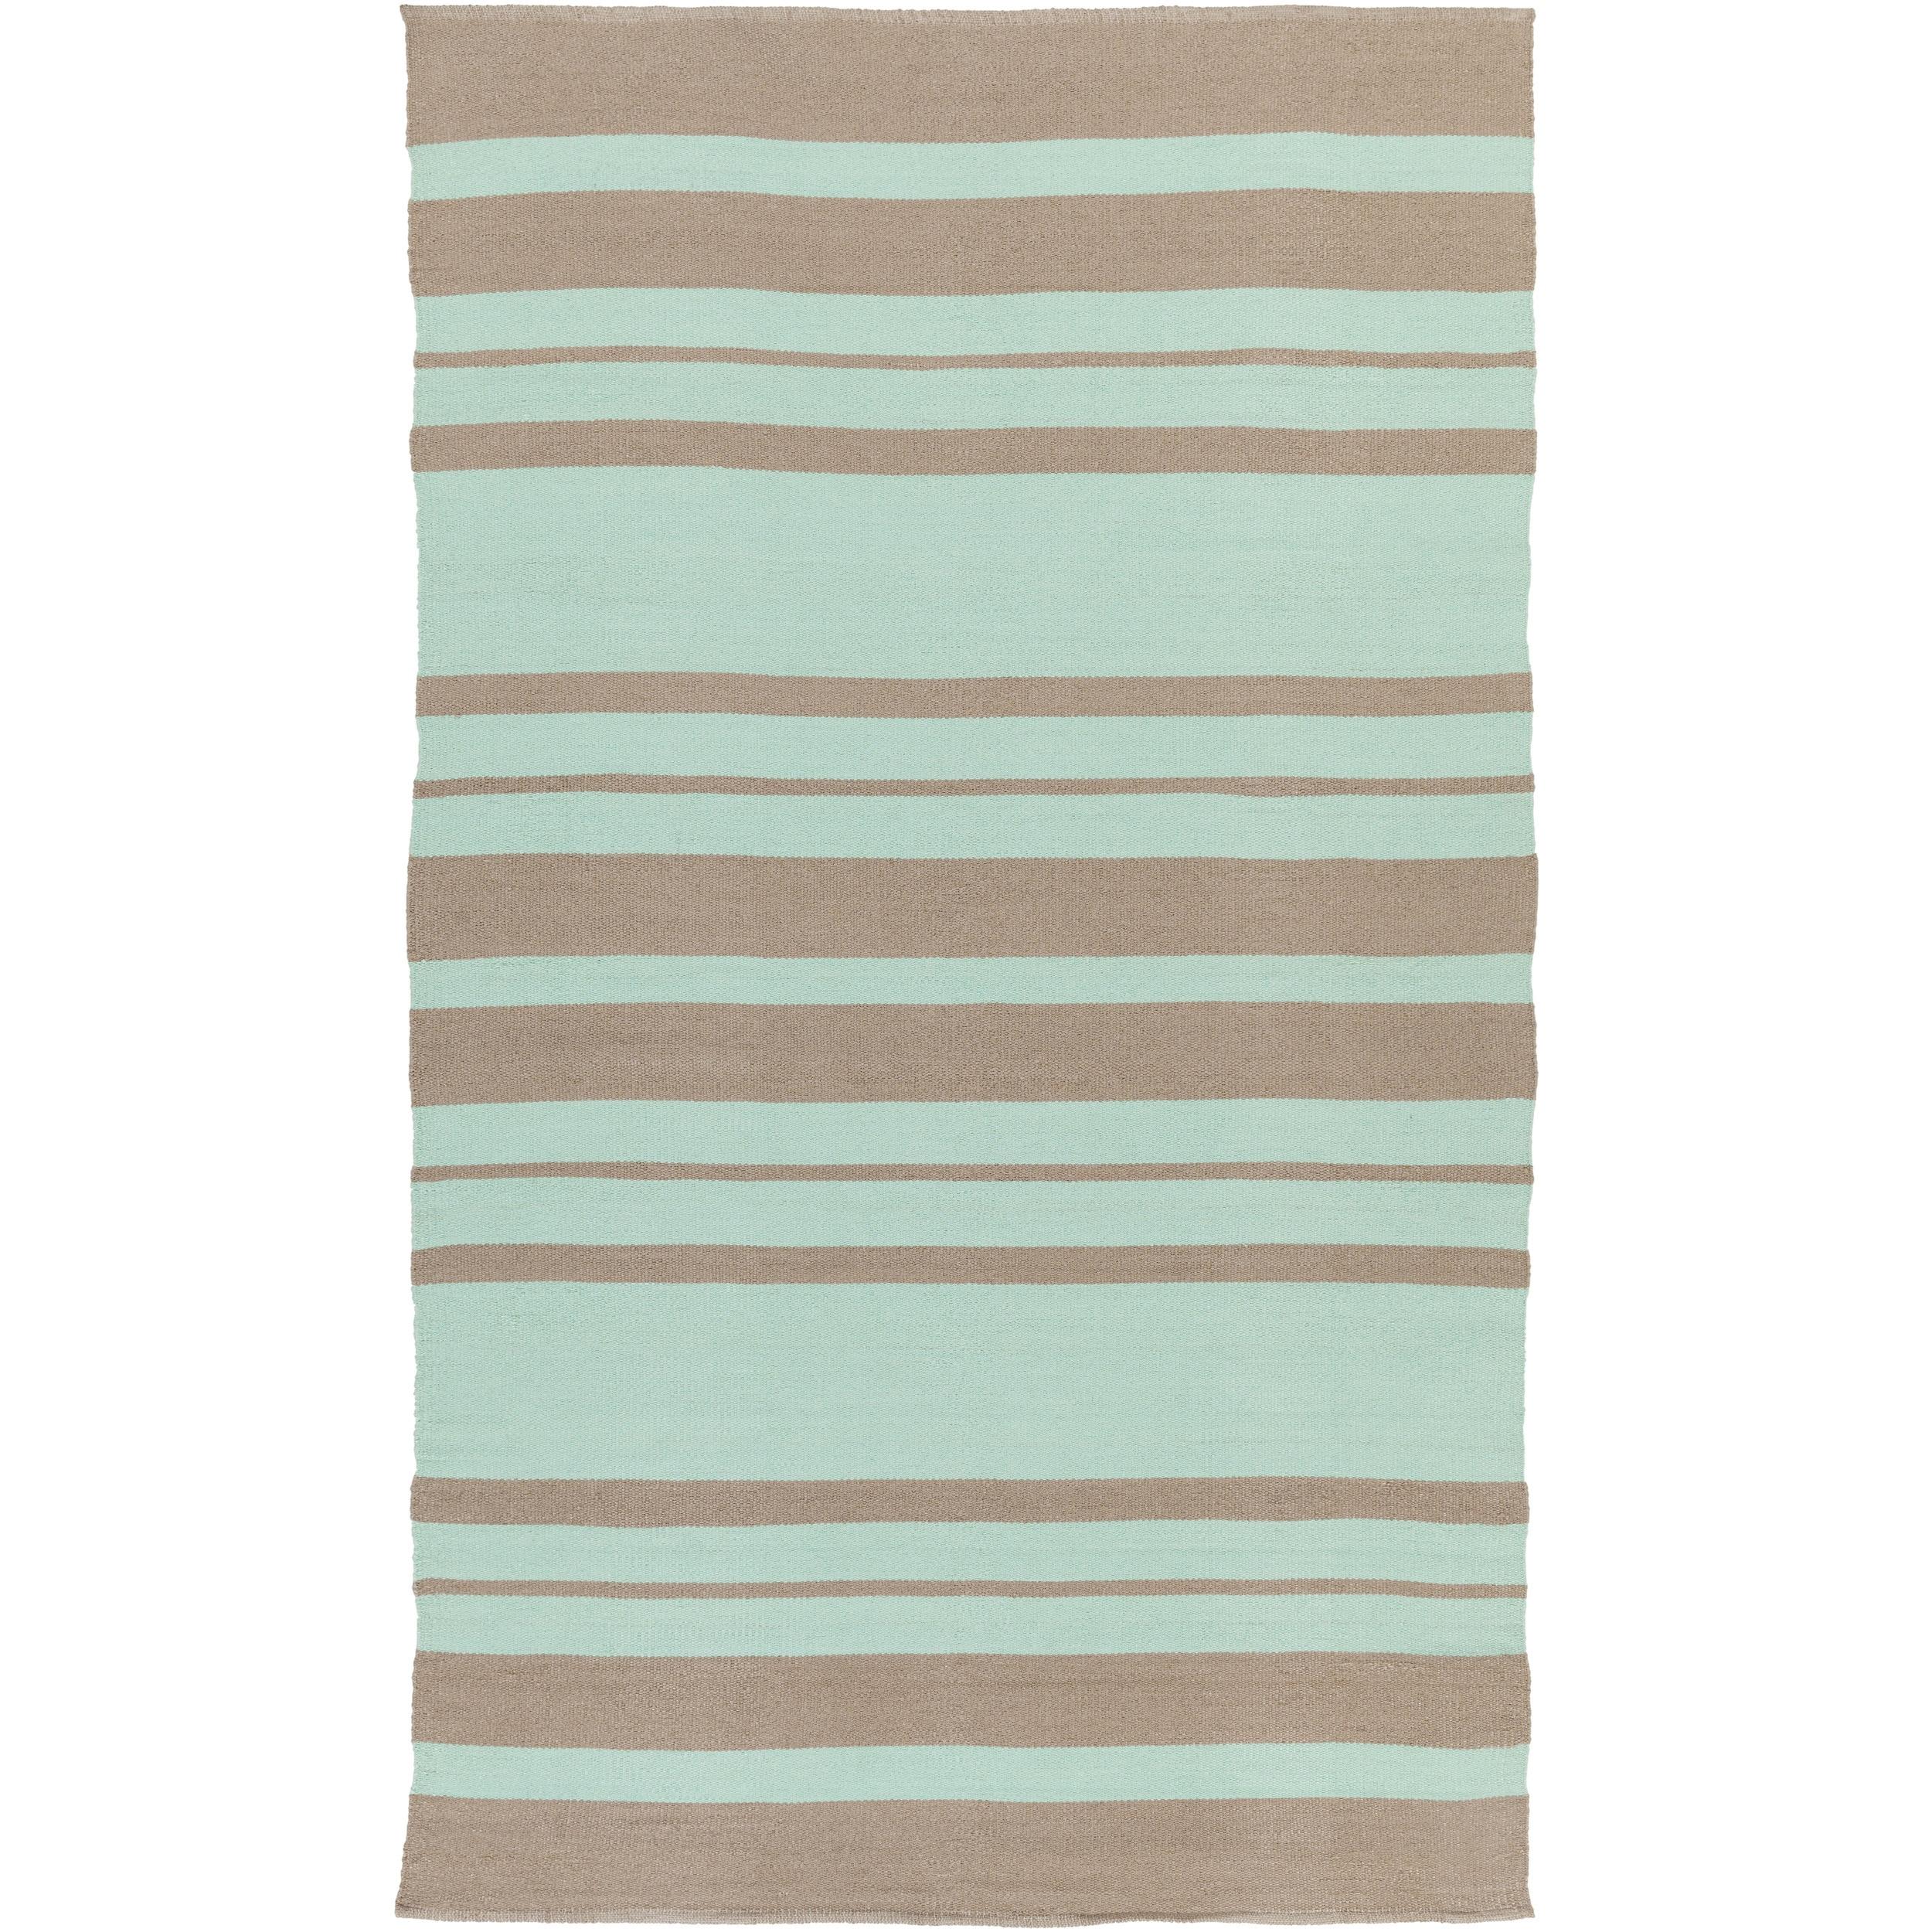 Hand-Woven Jorge Stripe PVC Area Rug (8' x 11') - 8' x 11'